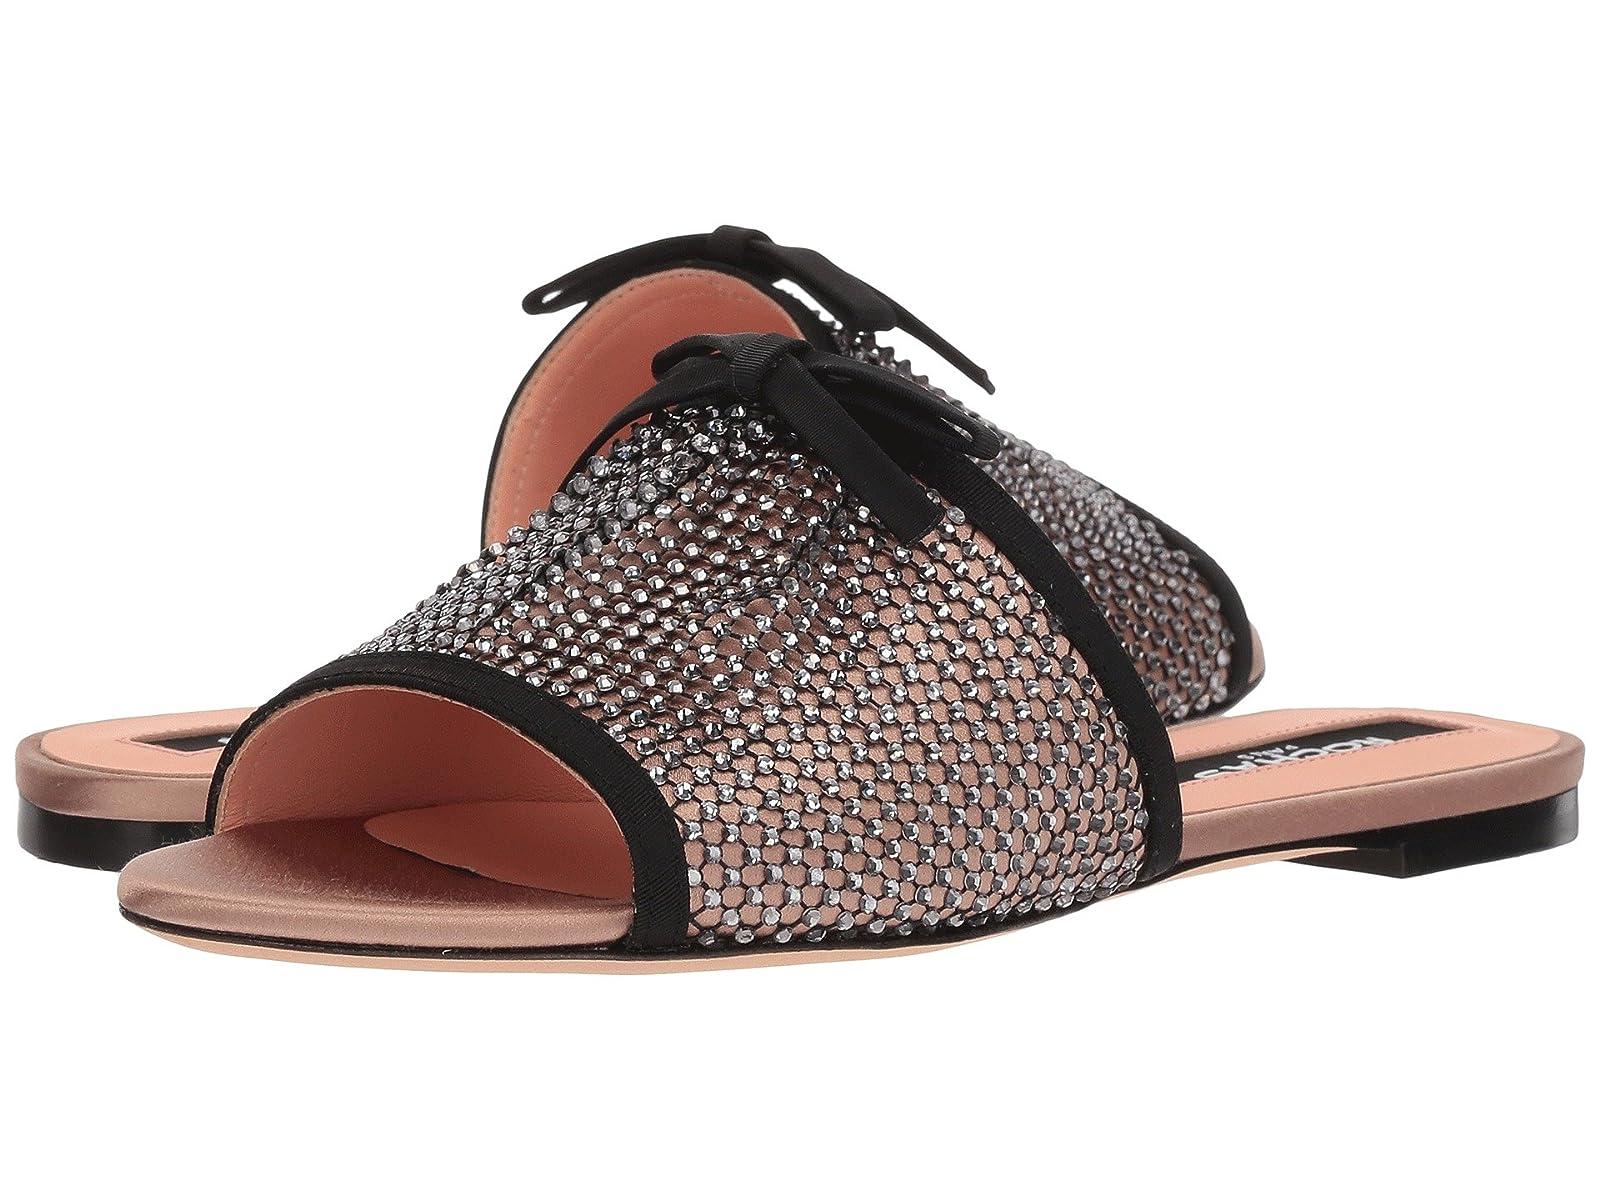 Rochas Flat SandalsAtmospheric grades have affordable shoes